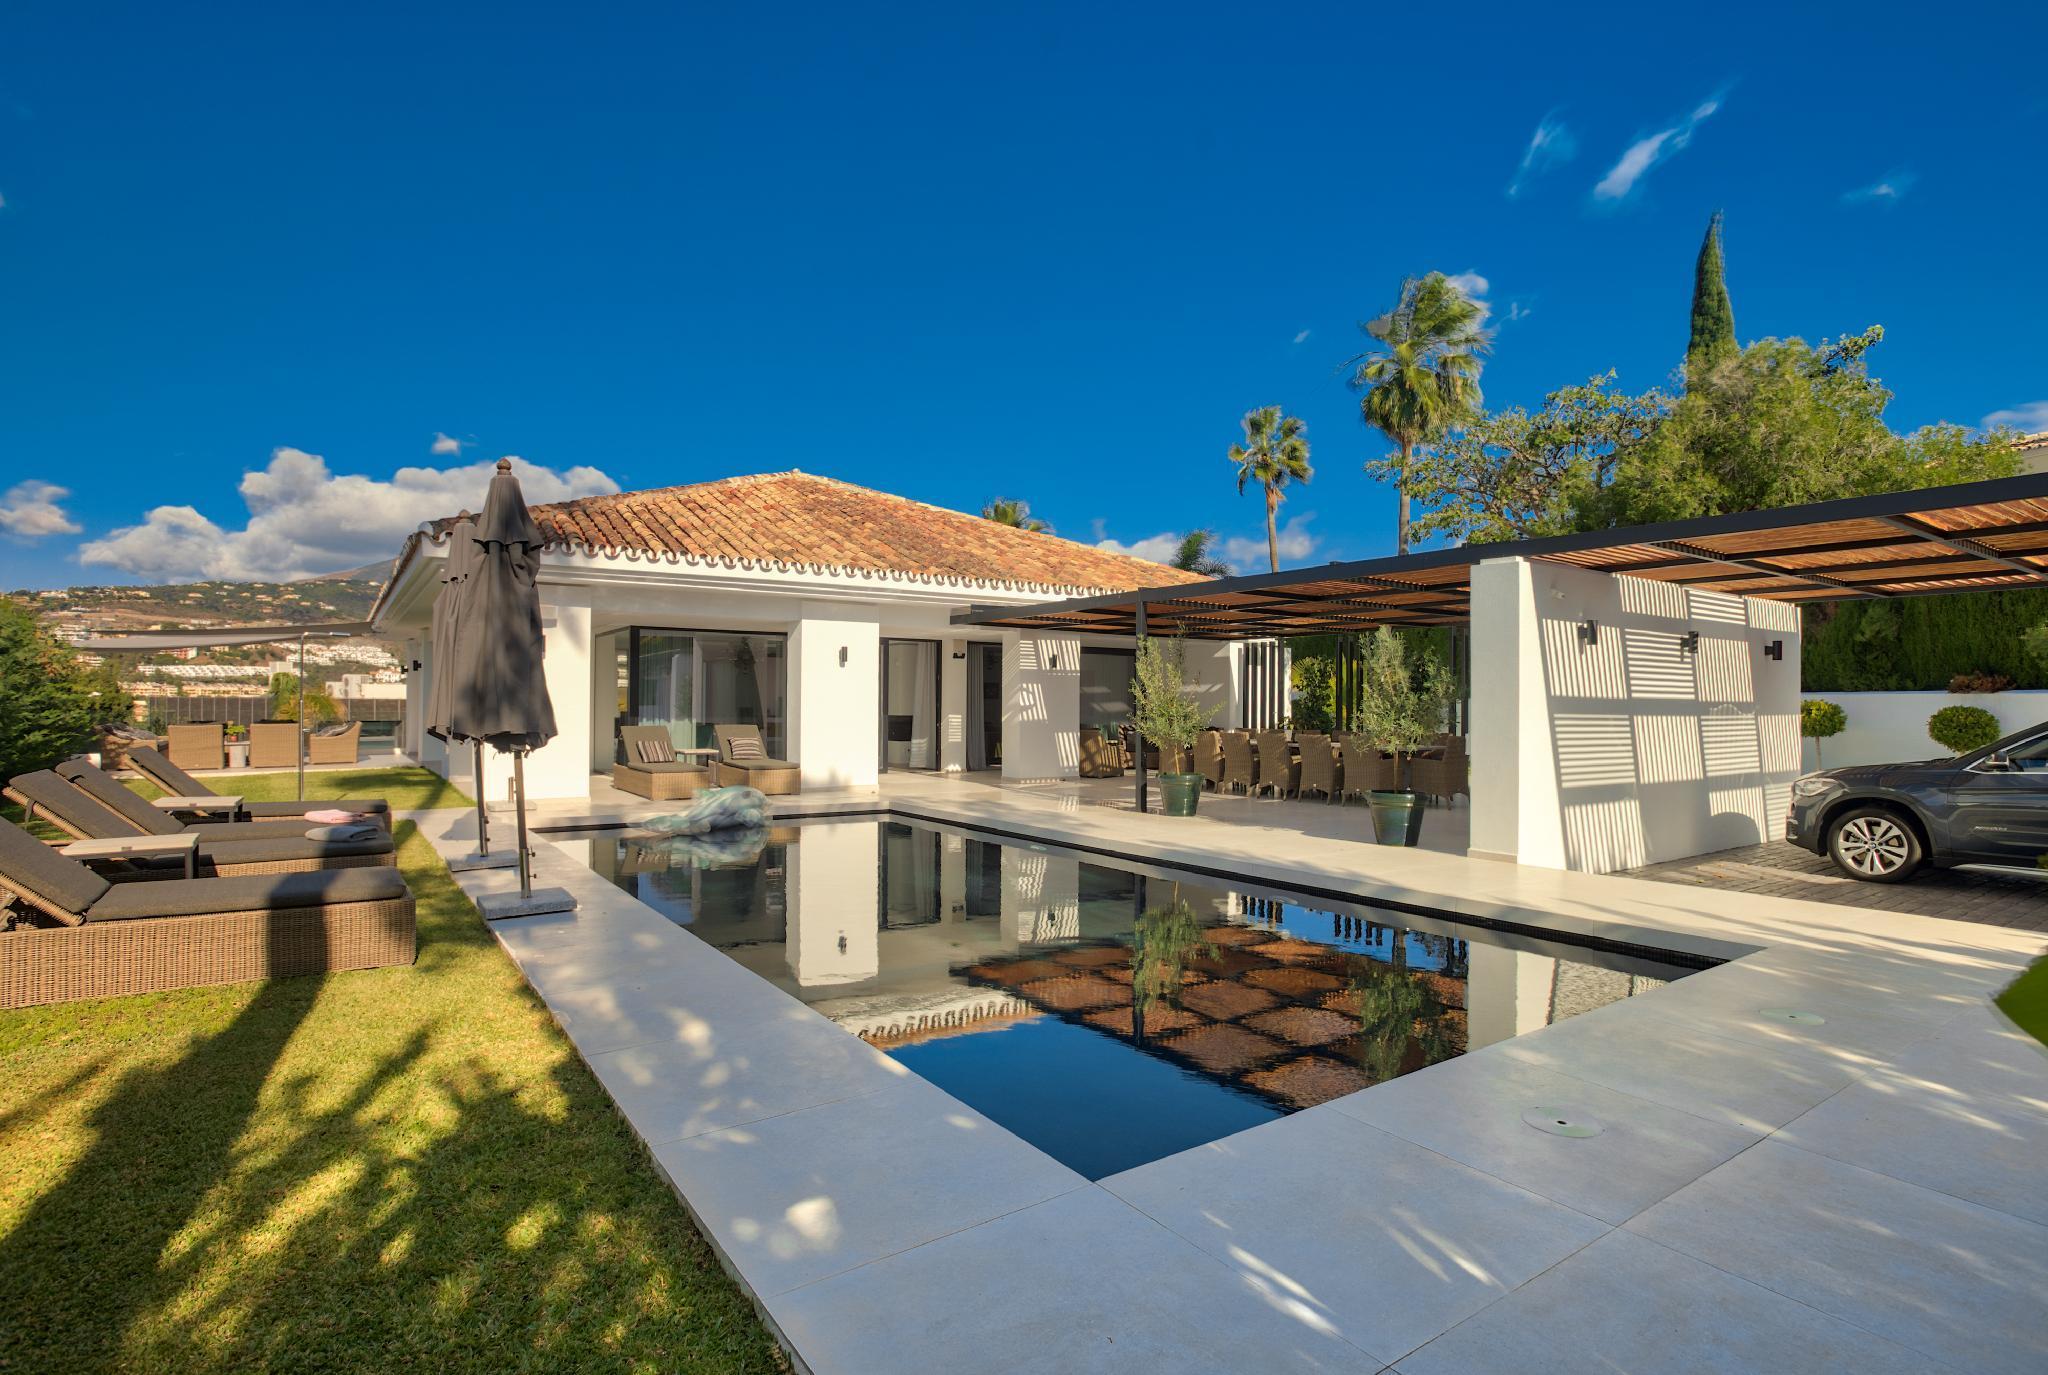 ***Casa Orion   Luxury Villa In Marbella***